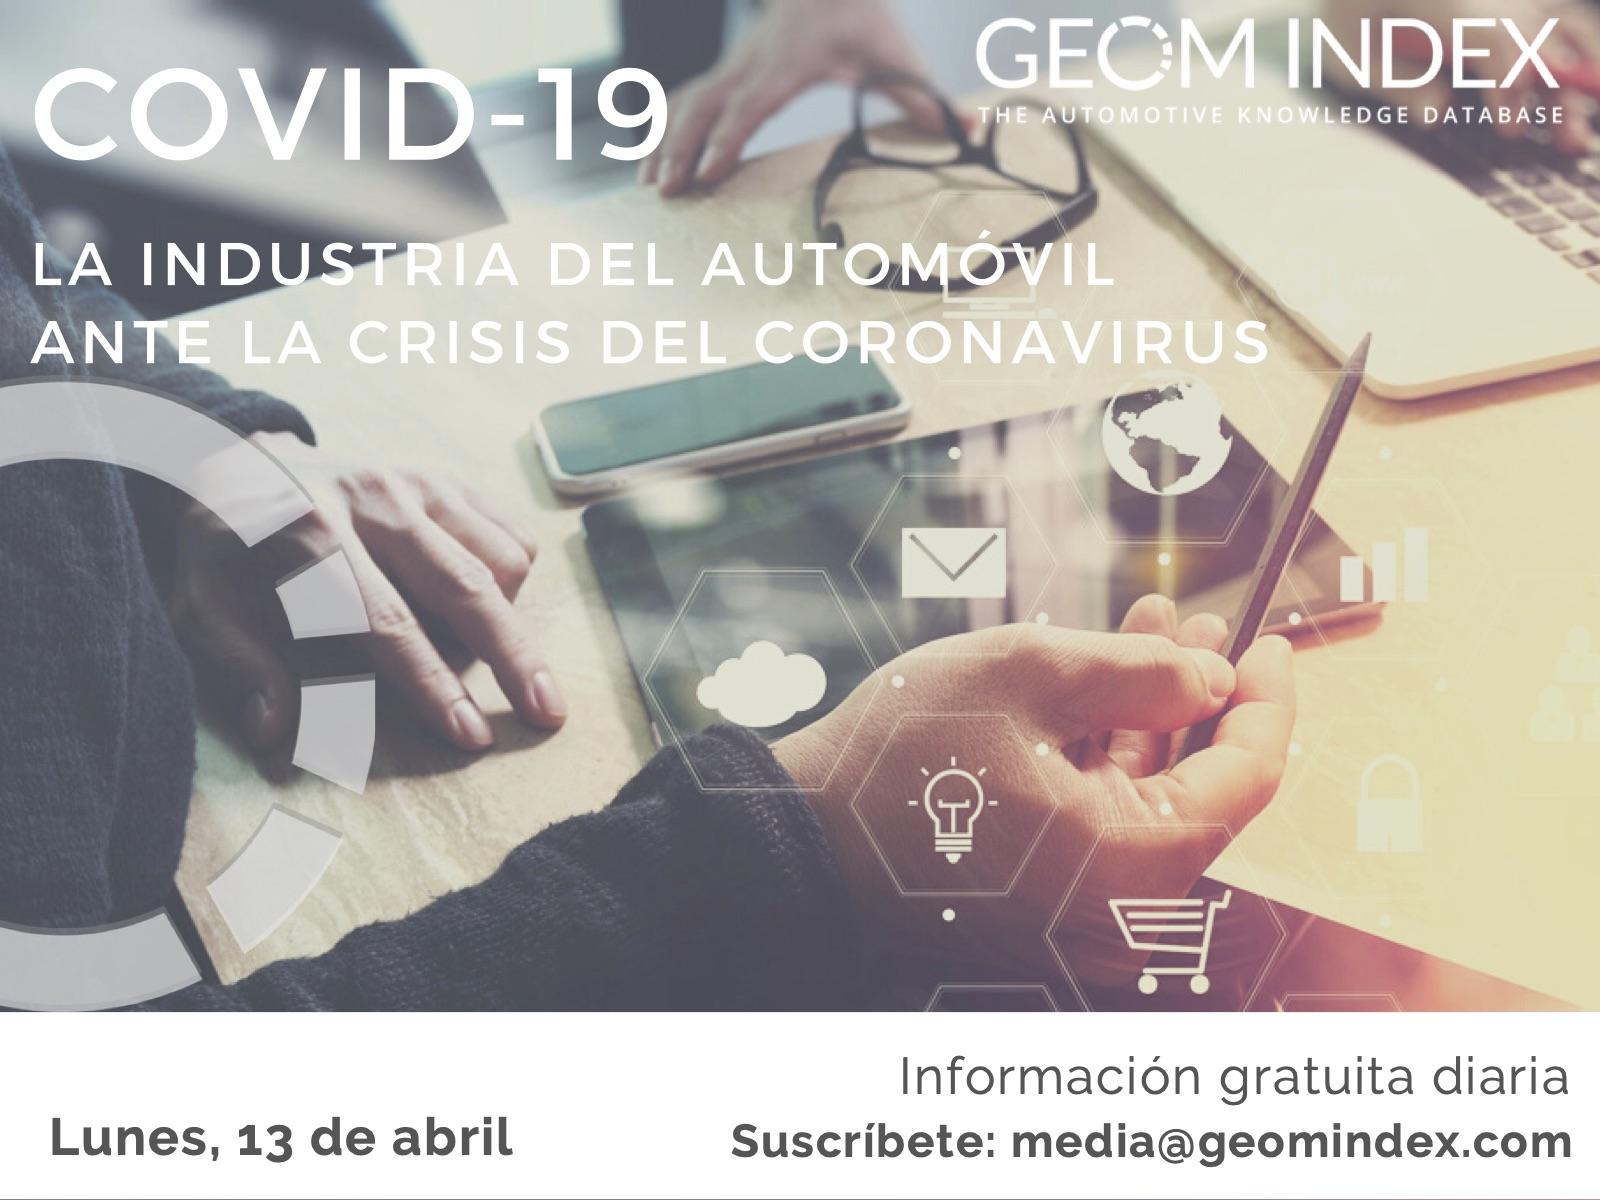 Informe 13 de abril – La industria del automóvil ante la crisis del Covid-19